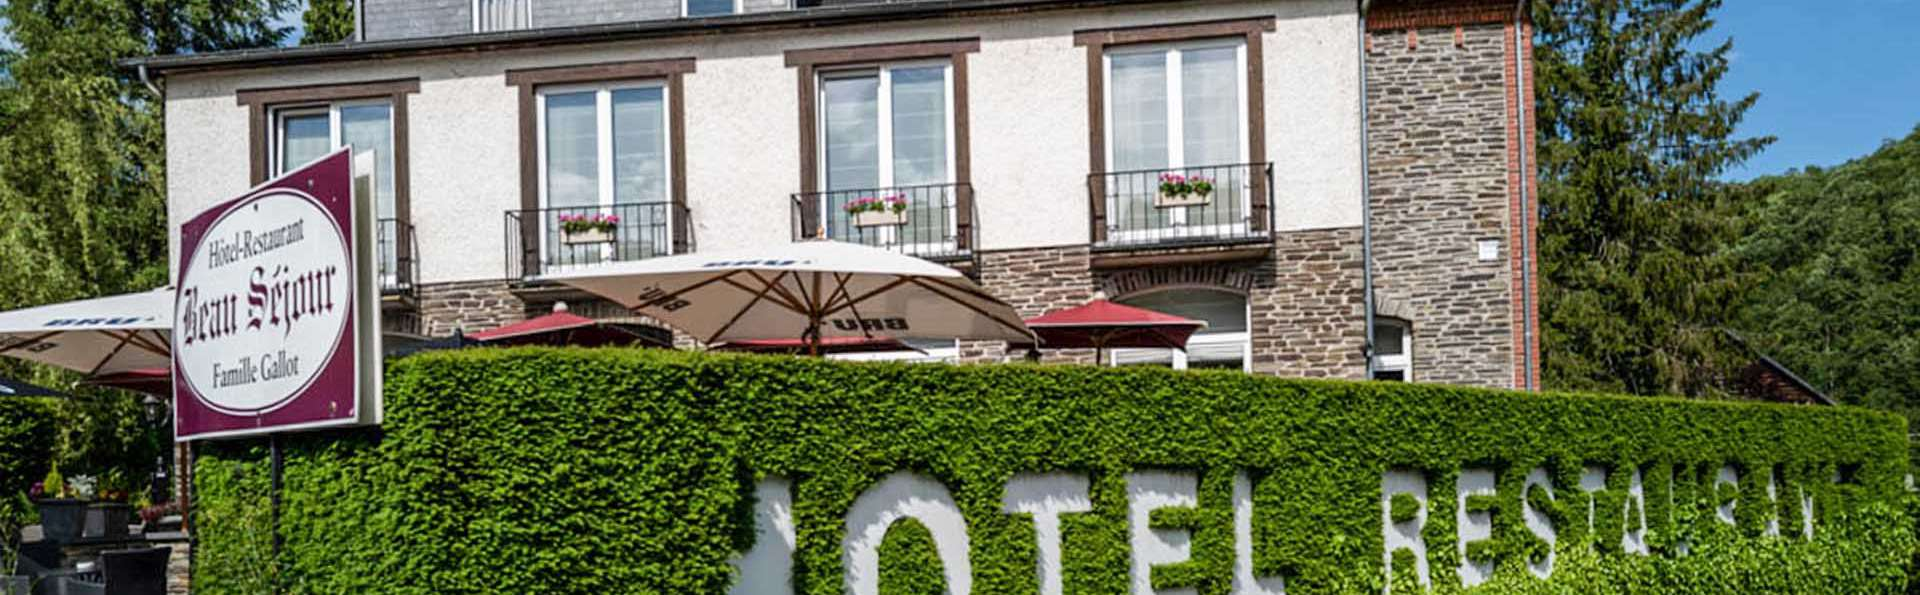 Hôtel-Restaurant Beau Séjour - EDIT_hotel-beausejour_12.jpg